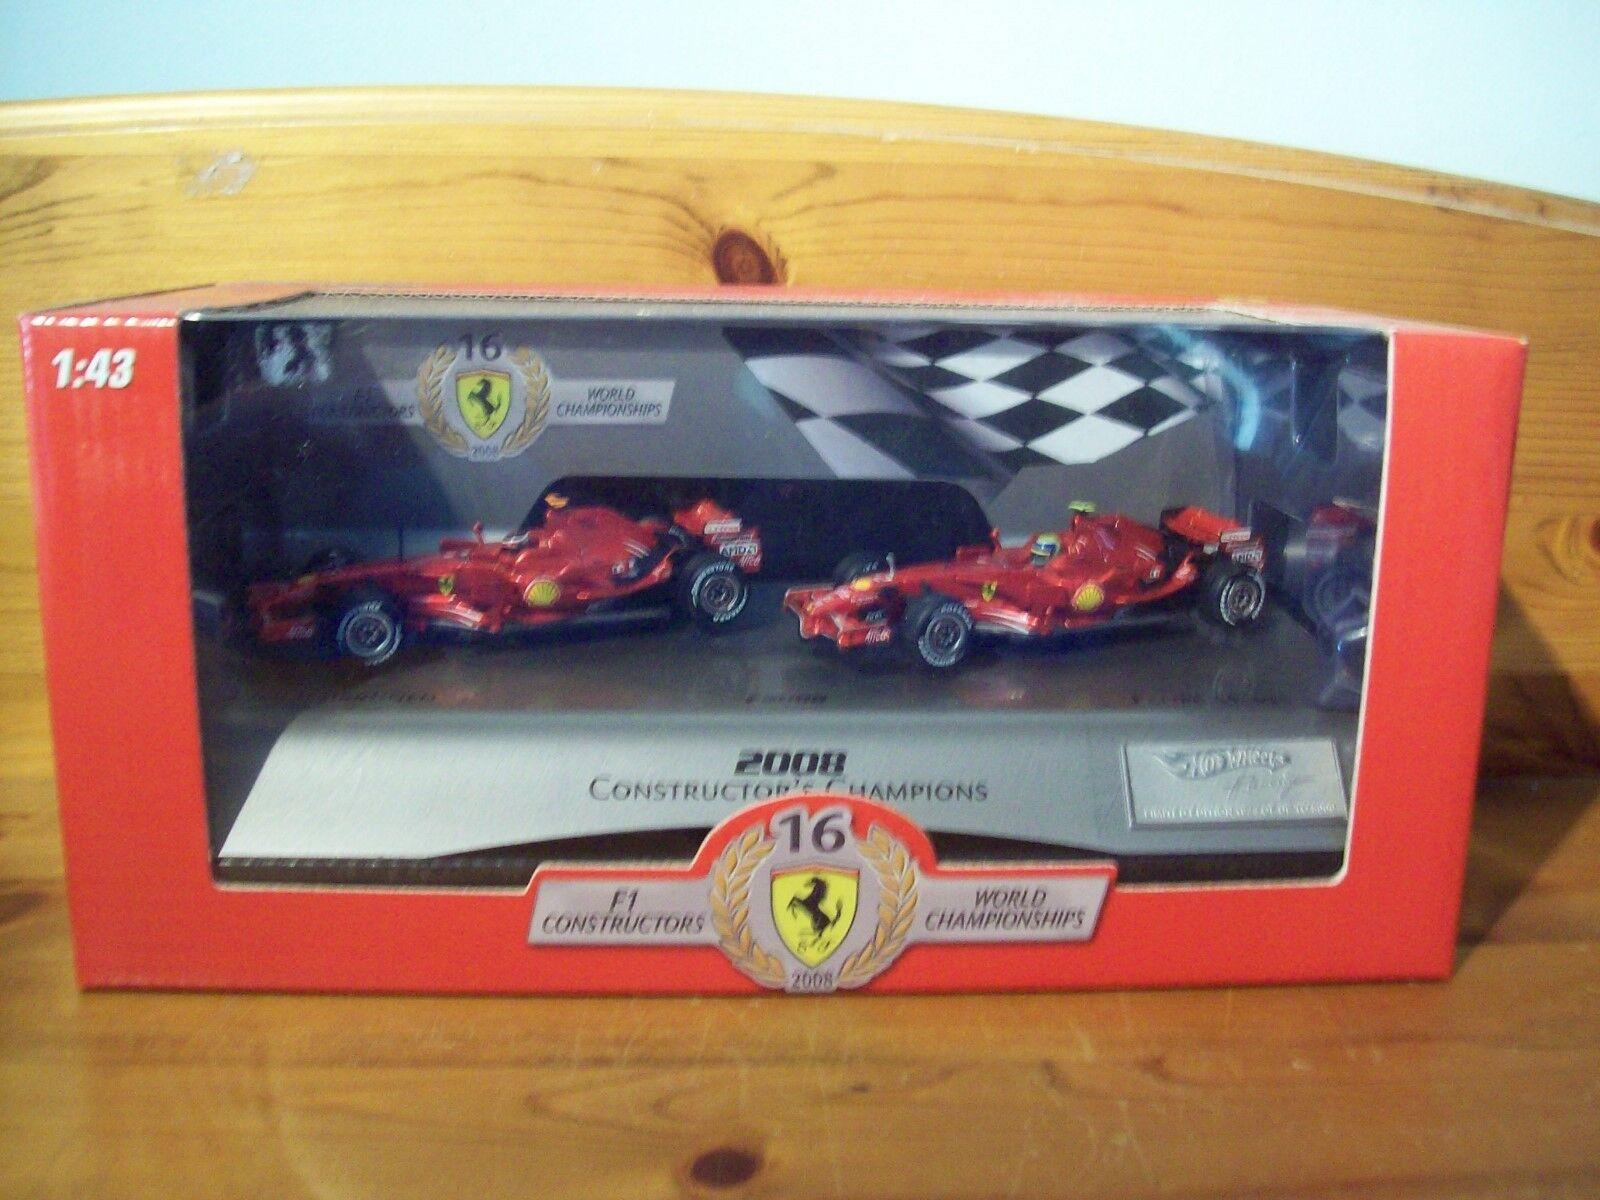 1/43 Hot Wheels TWIN-SET FERRARI F2008 Kimi Raikkonen Felipe Massa 2008 construire | De Fin D'année Bonnes Affaires Vente